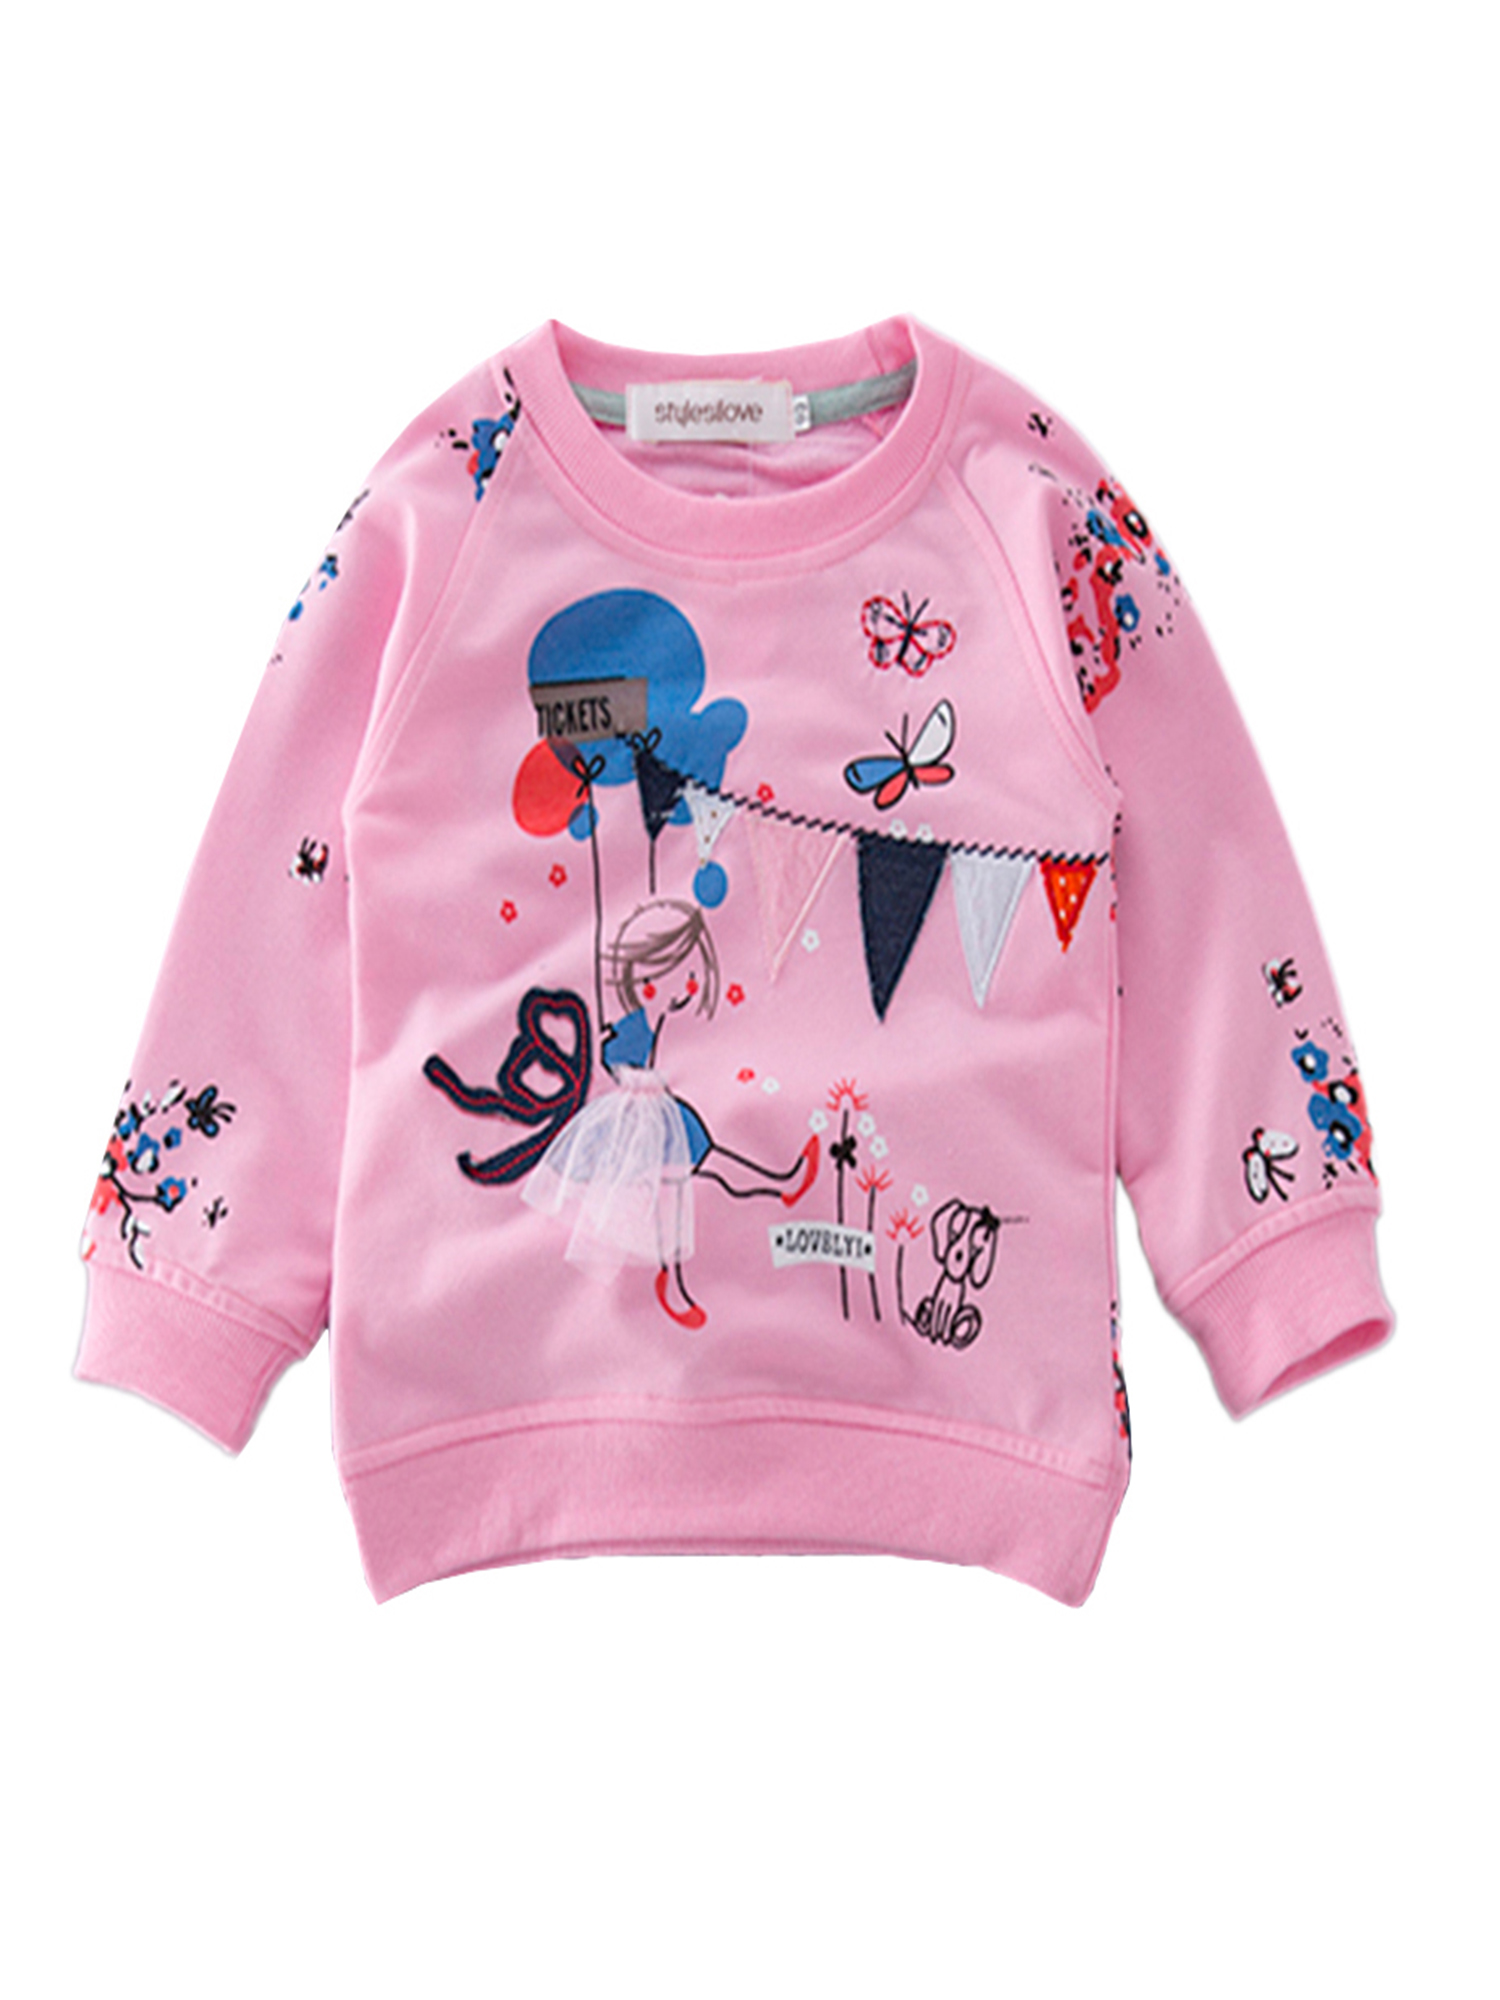 stylesilove Pattern Sweatshirt and Jeans Little Girls Outfit (Pink Sweatshirt, 90/18-24 Months)